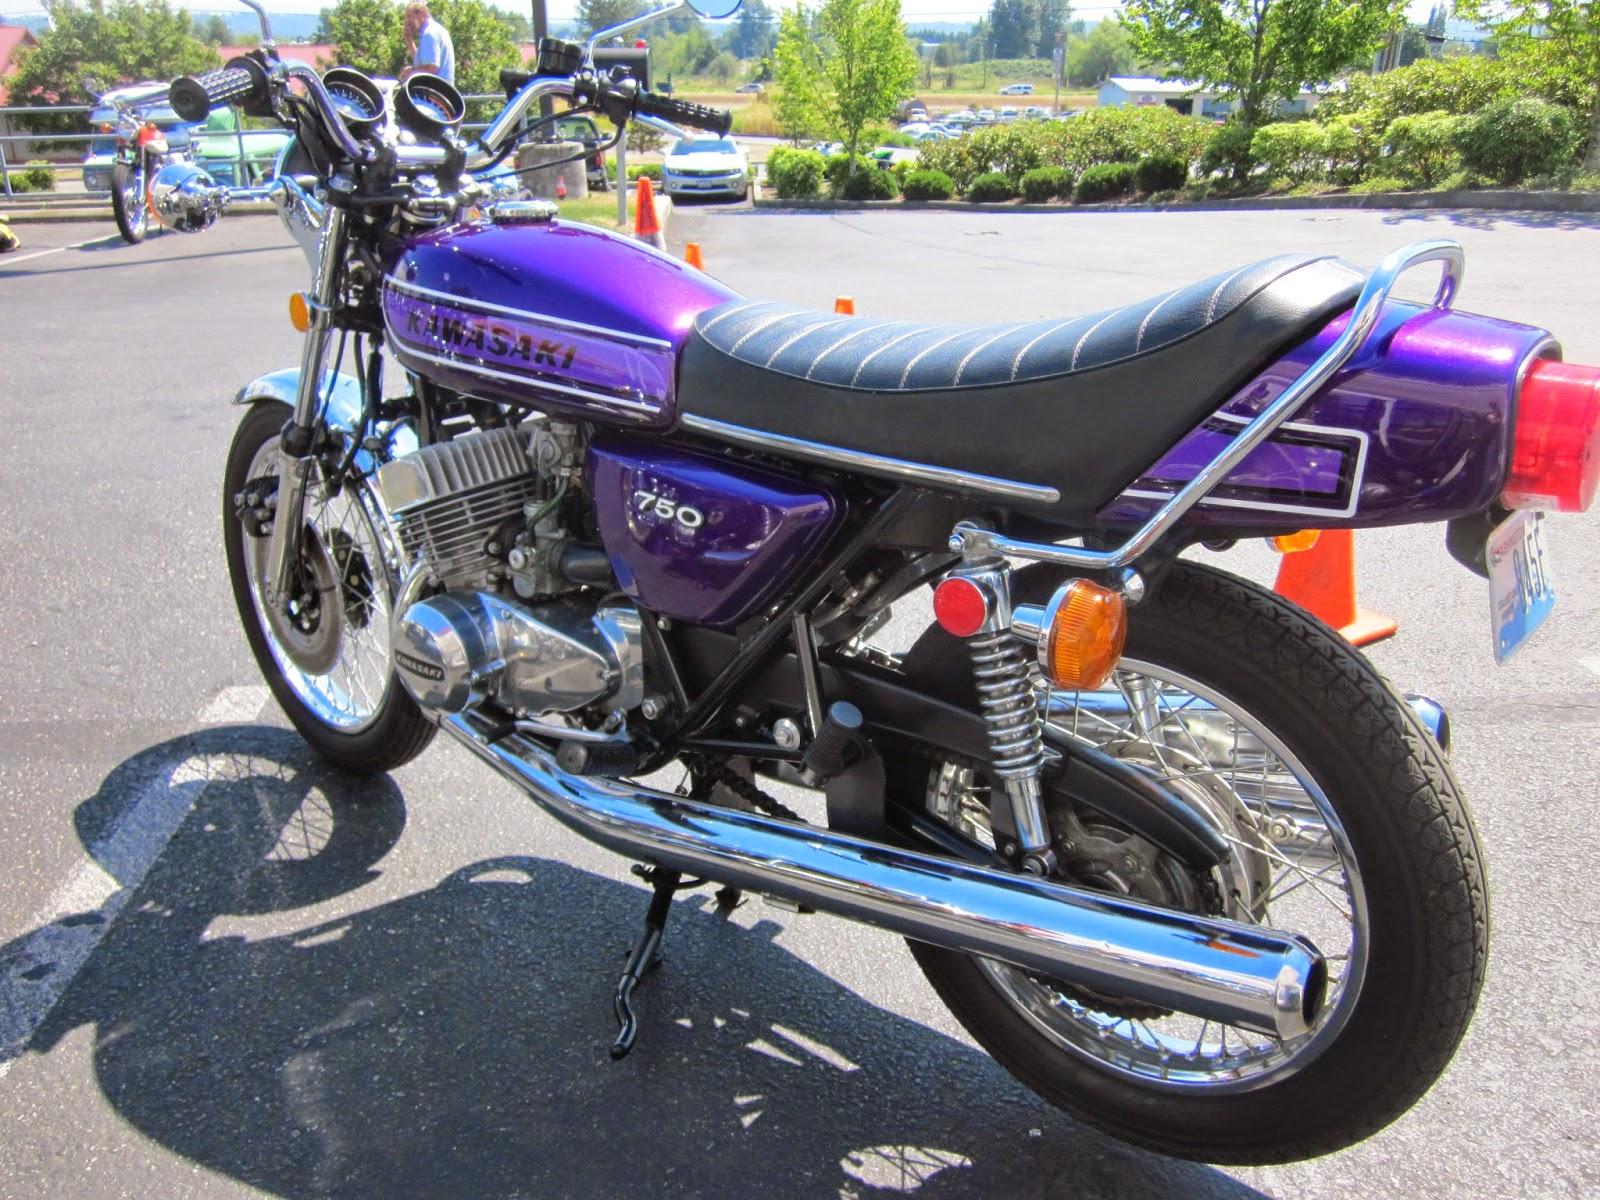 OldMotoDude: 1974 Kawasaki H2 750 Triple on display at the 2014 VJMC